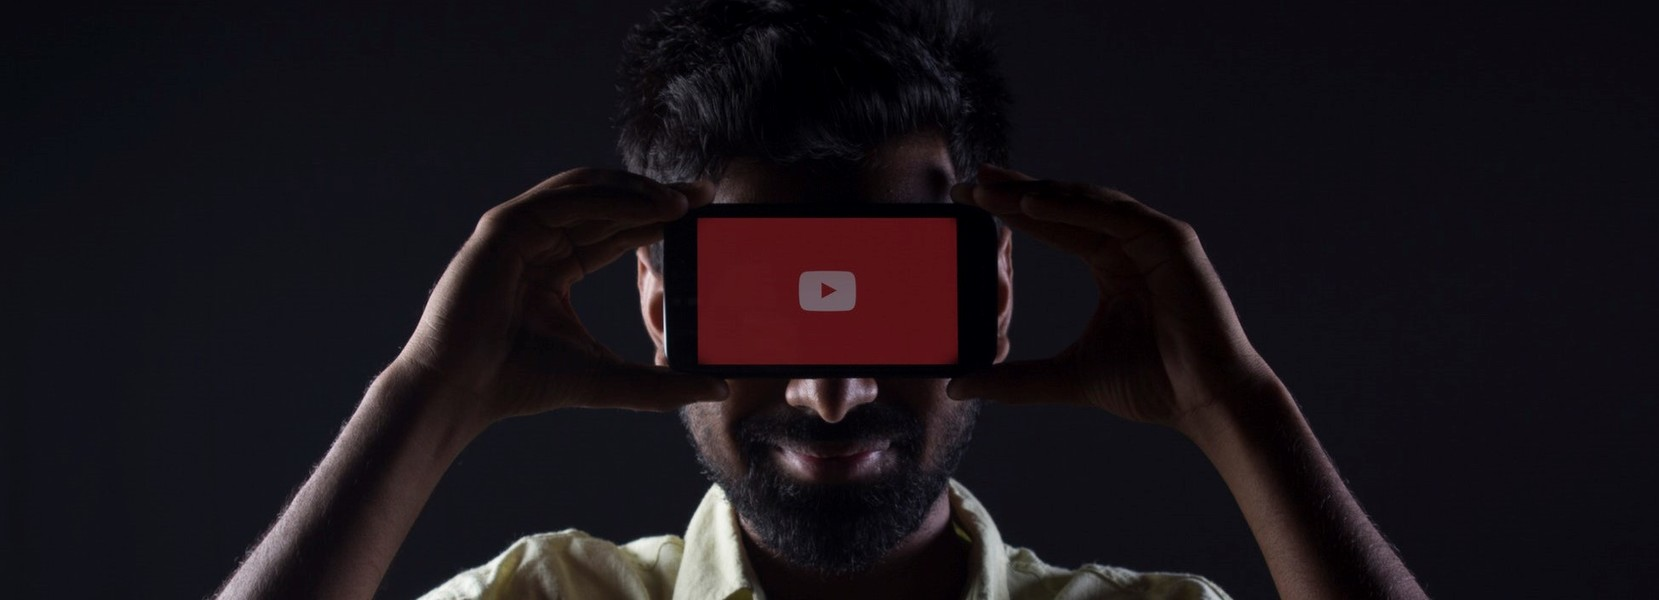 The Great YouTube War: PewDiePie vs T-Series